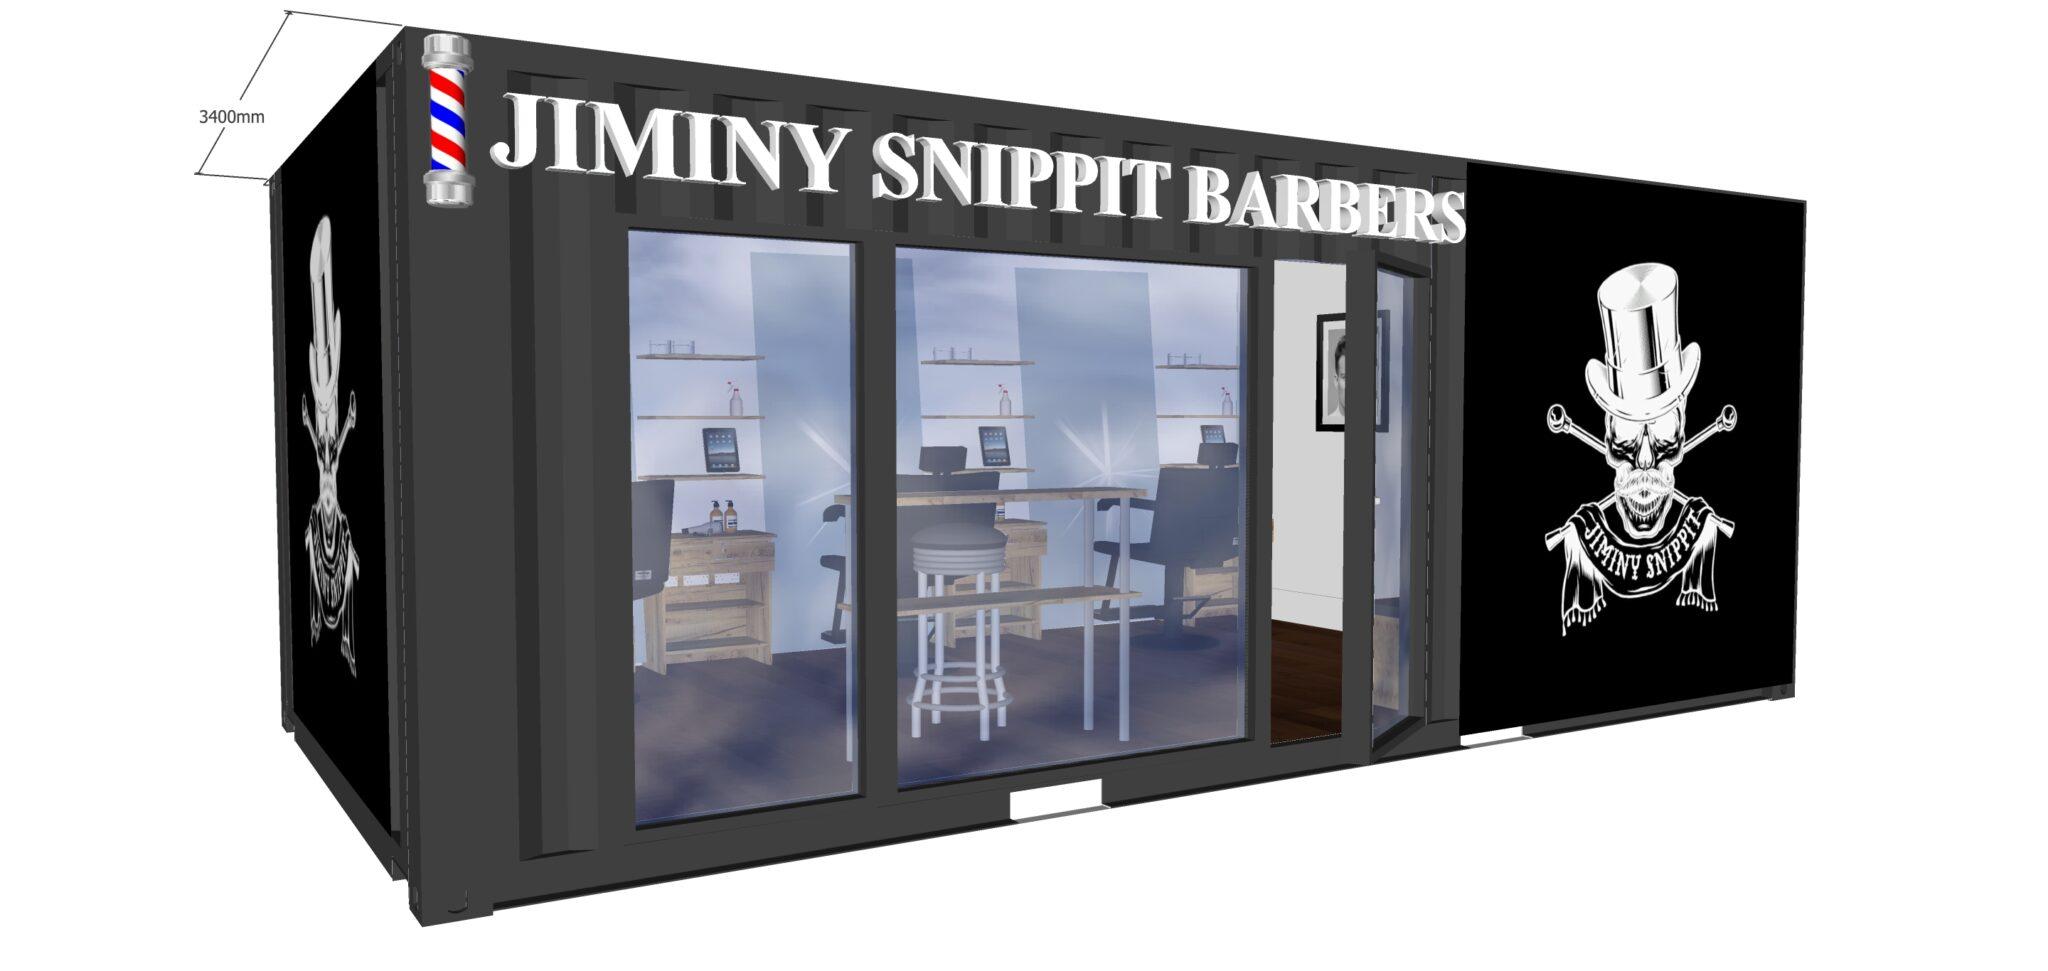 Jiminy Snippet Barbers Pod+ solar_1